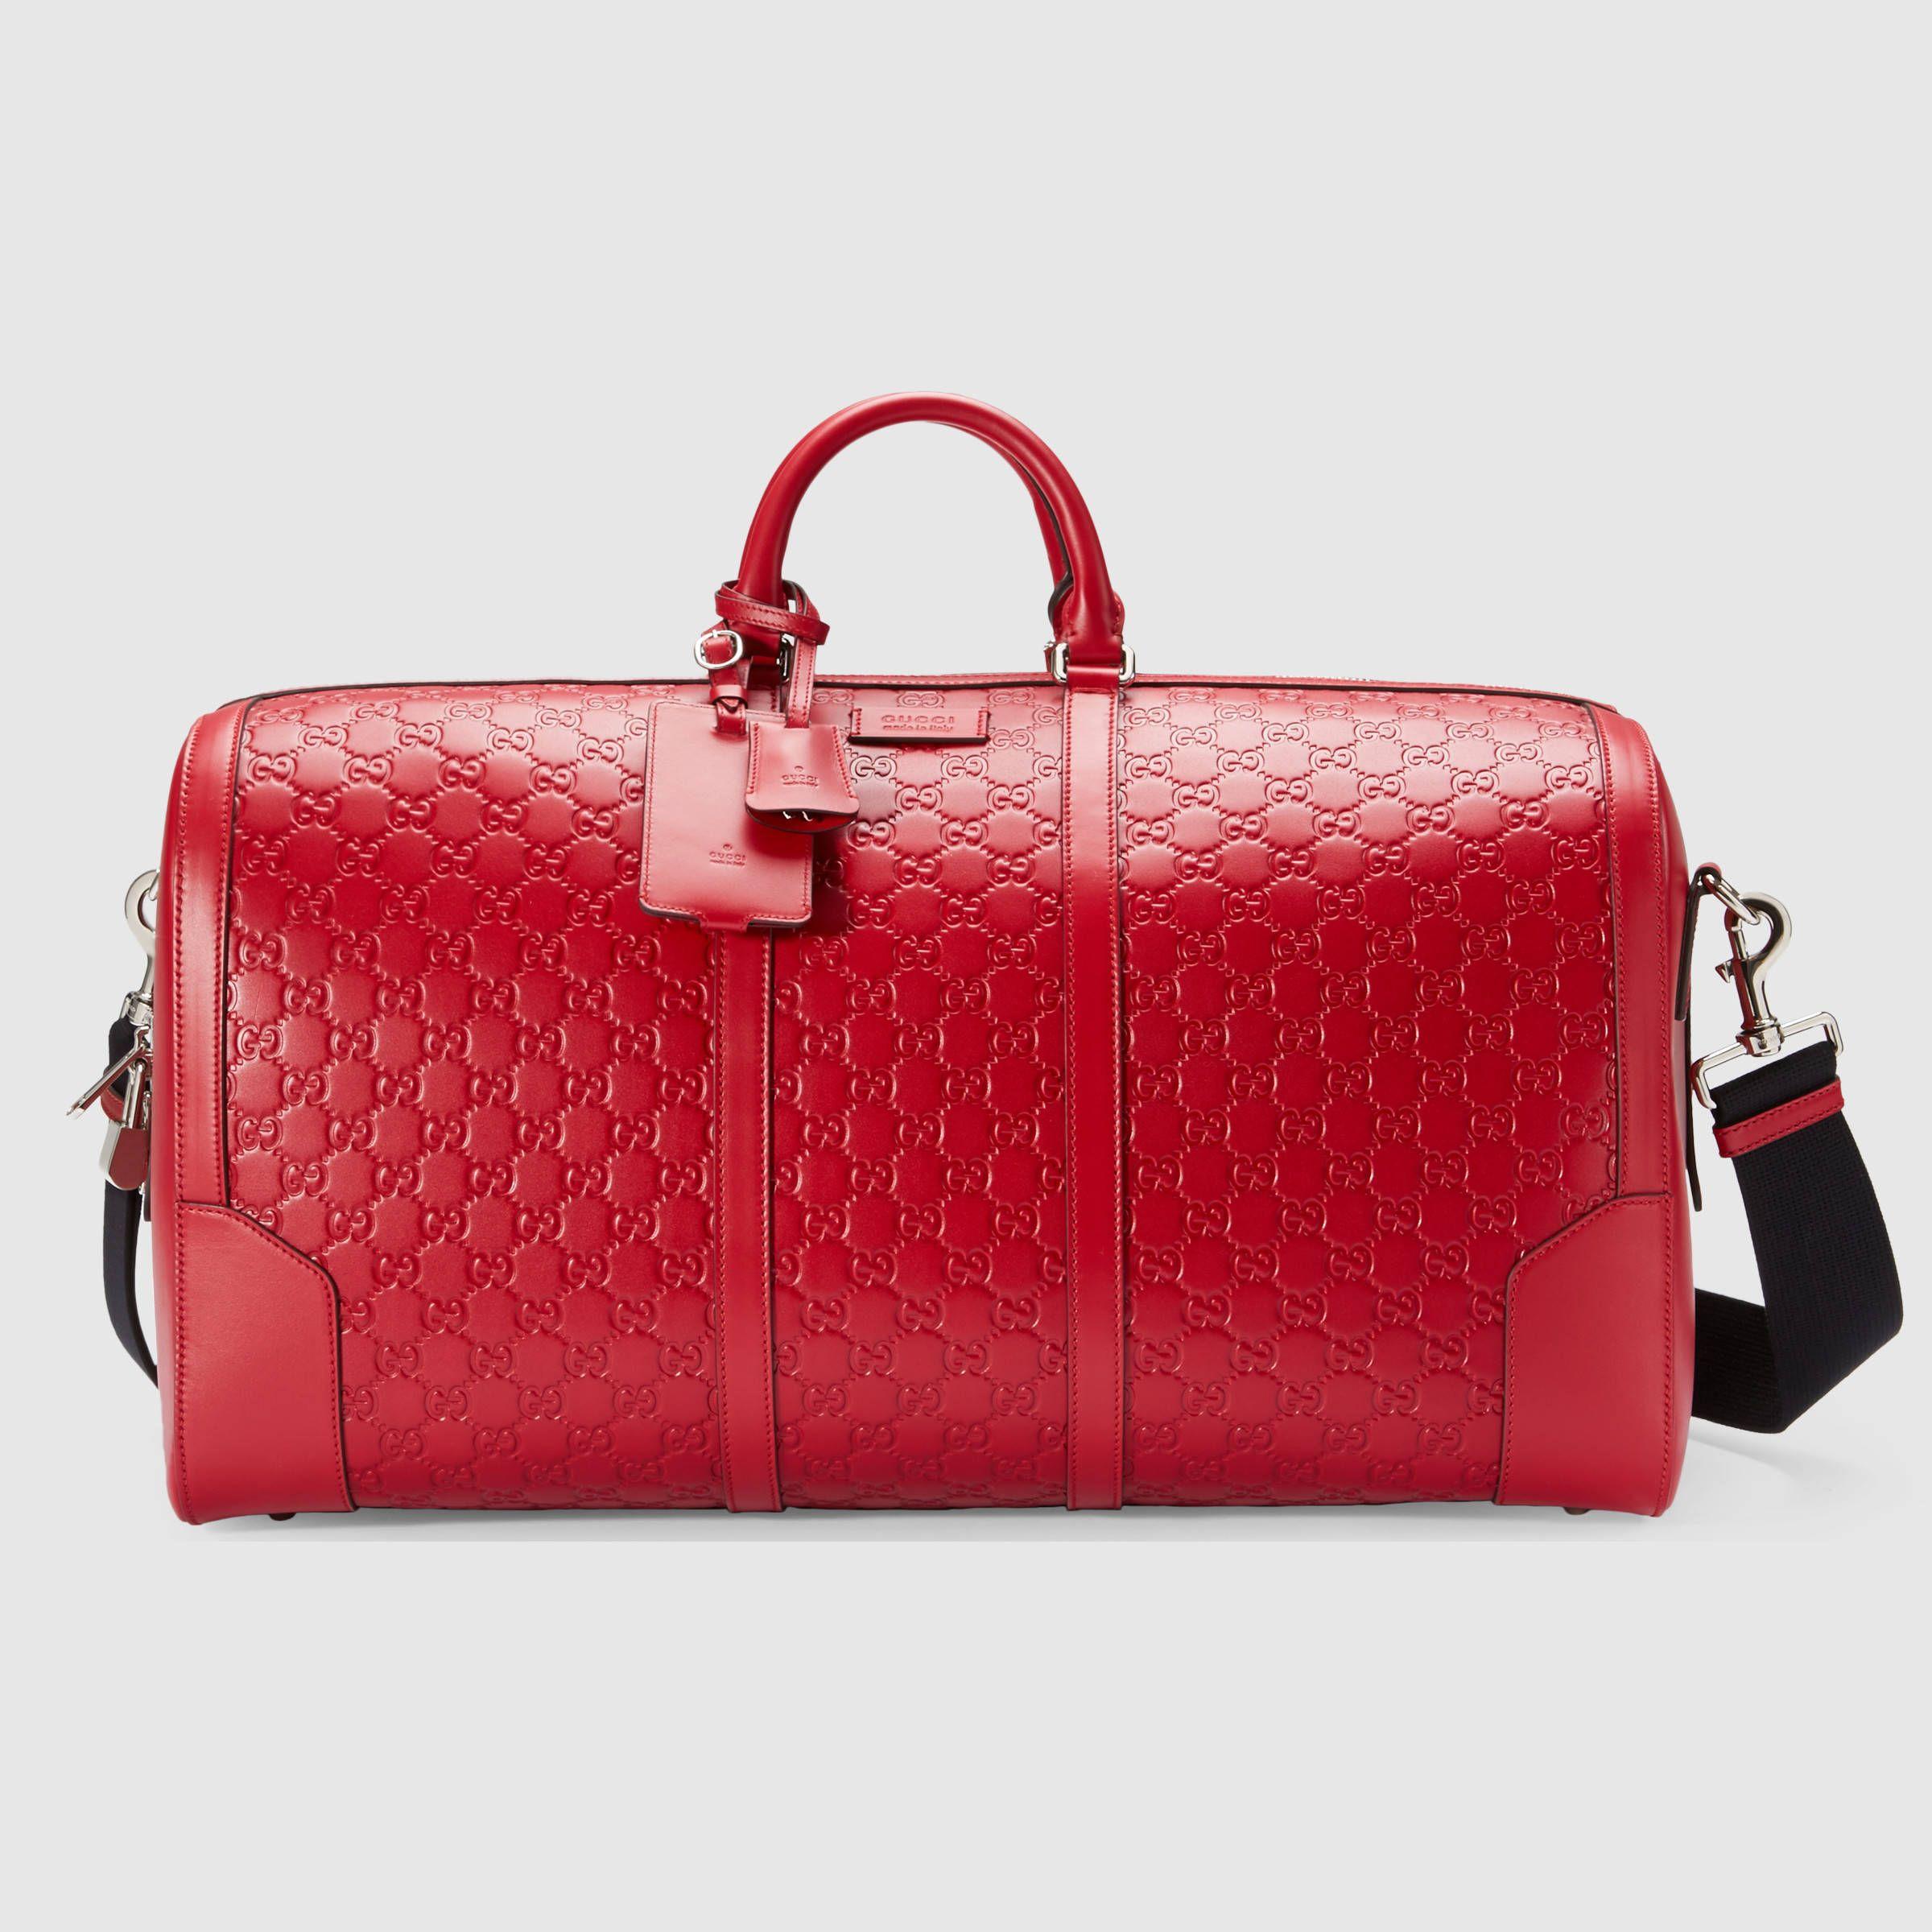 Gucci Signature Leather Duffle Leather Duffel Bag Leather Duffle Leather Duffle Bag